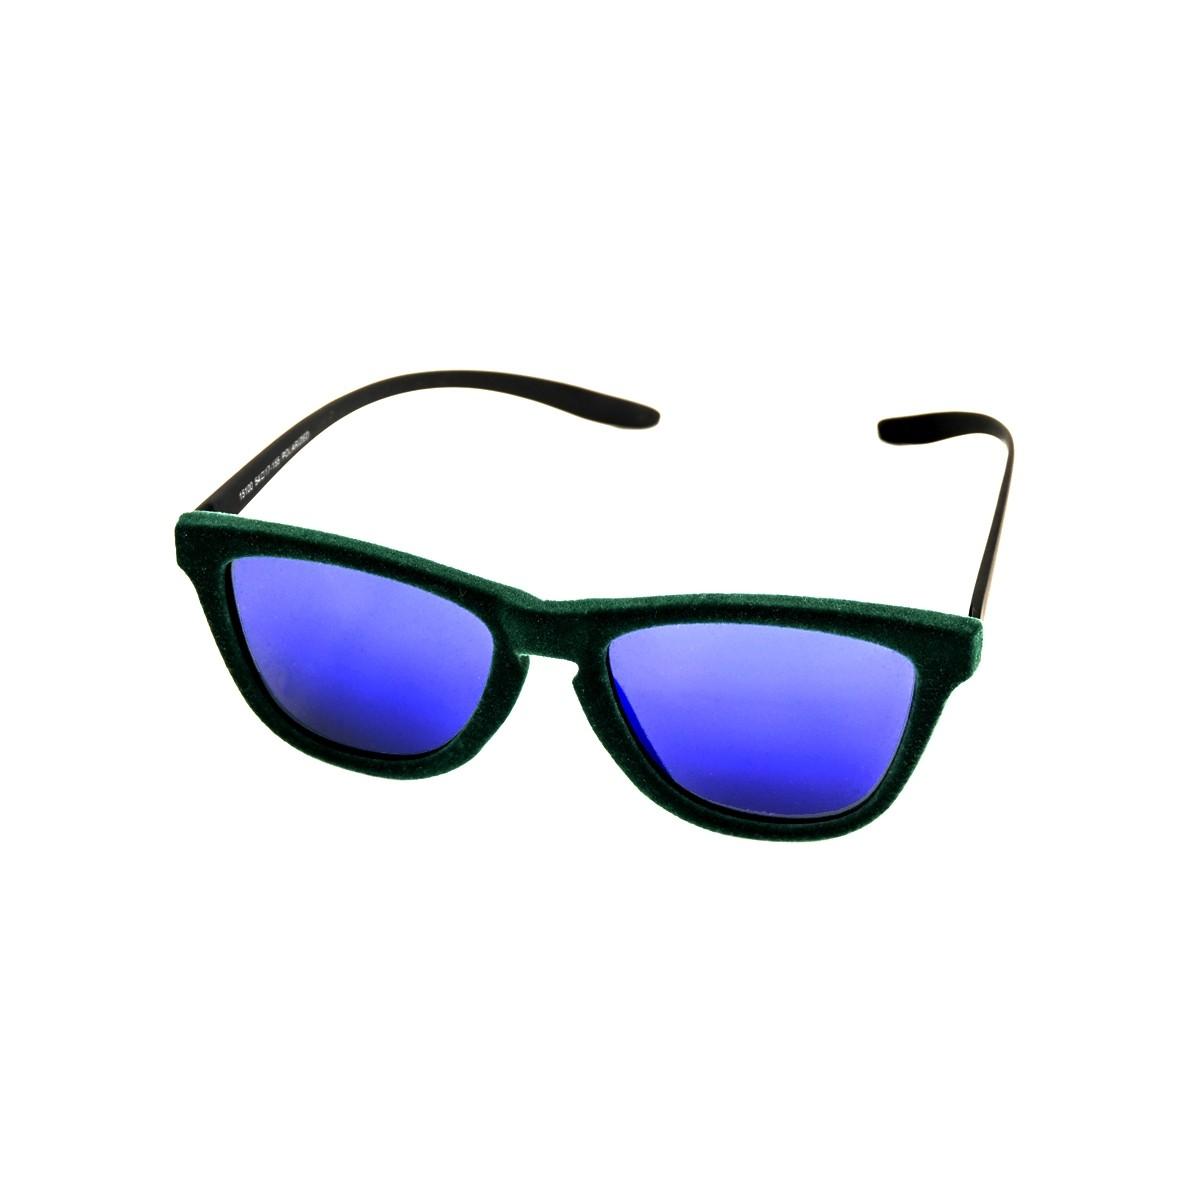 Centrostyle Koala 15100, 48,00€, Occhiali Centrostyle Verde a forma Squadrato